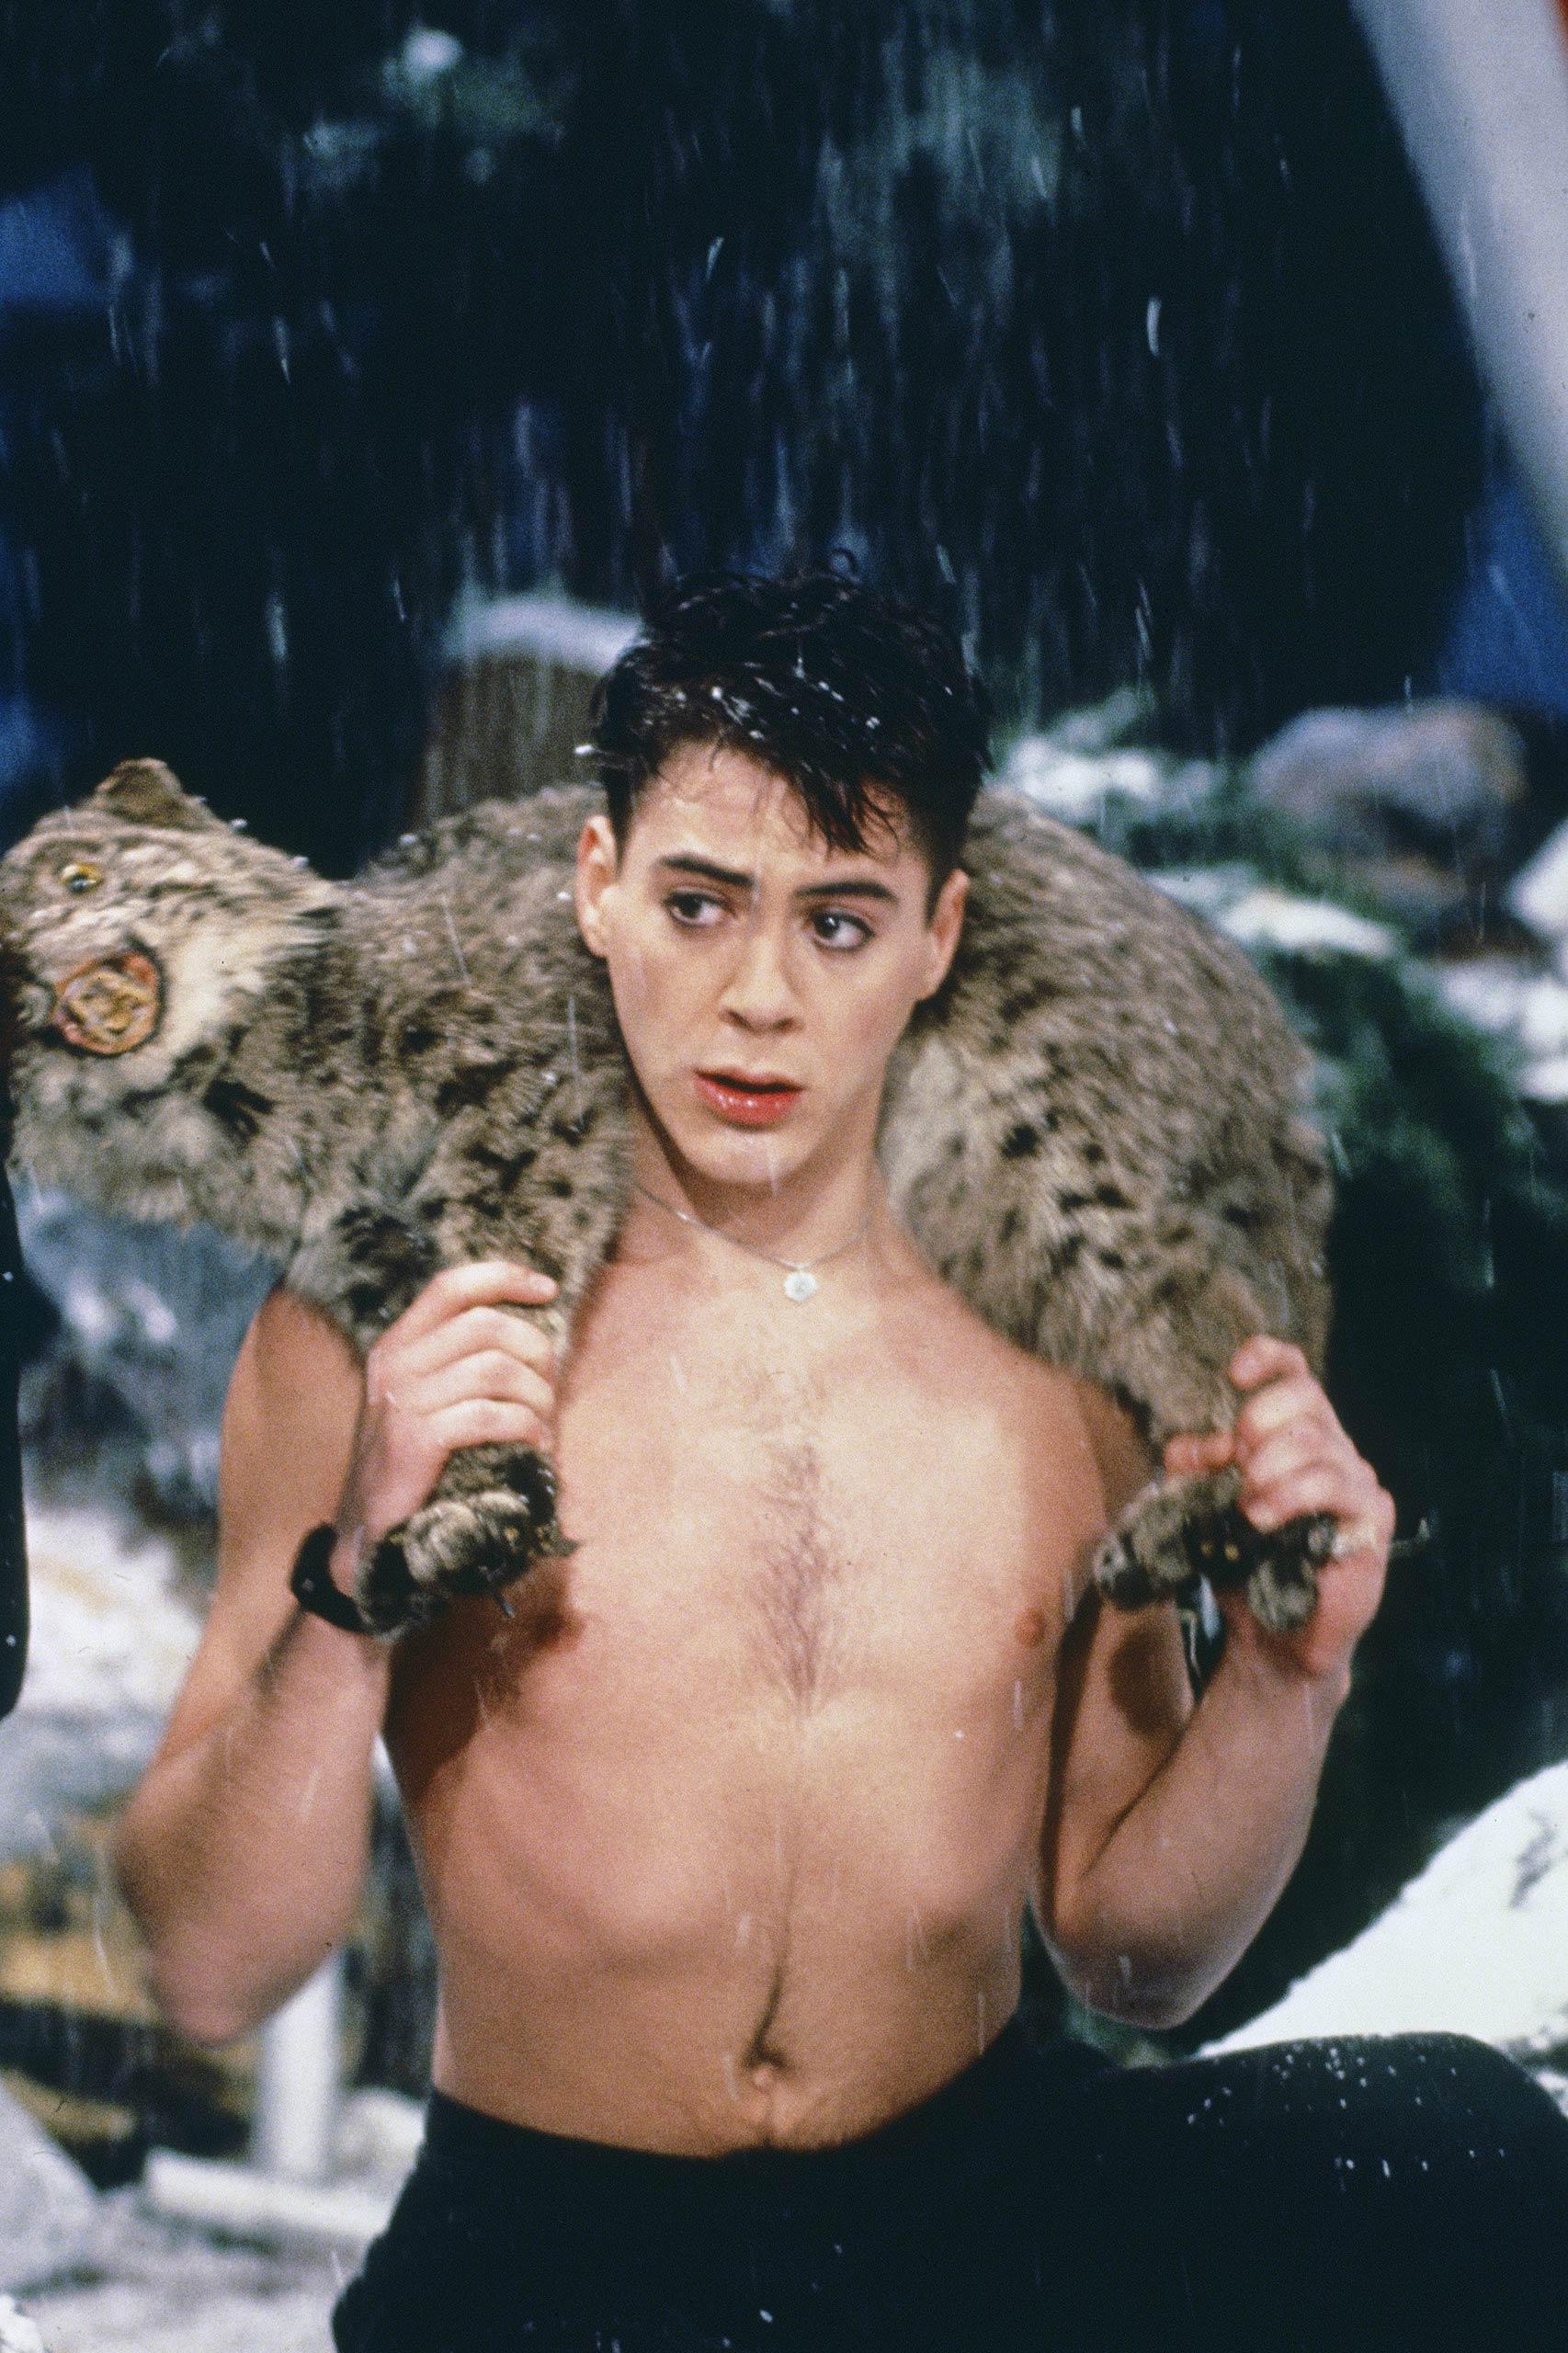 Robert Downey Jr. as Julian Lynch on <i>Saturday Night Live</i> in 1986.